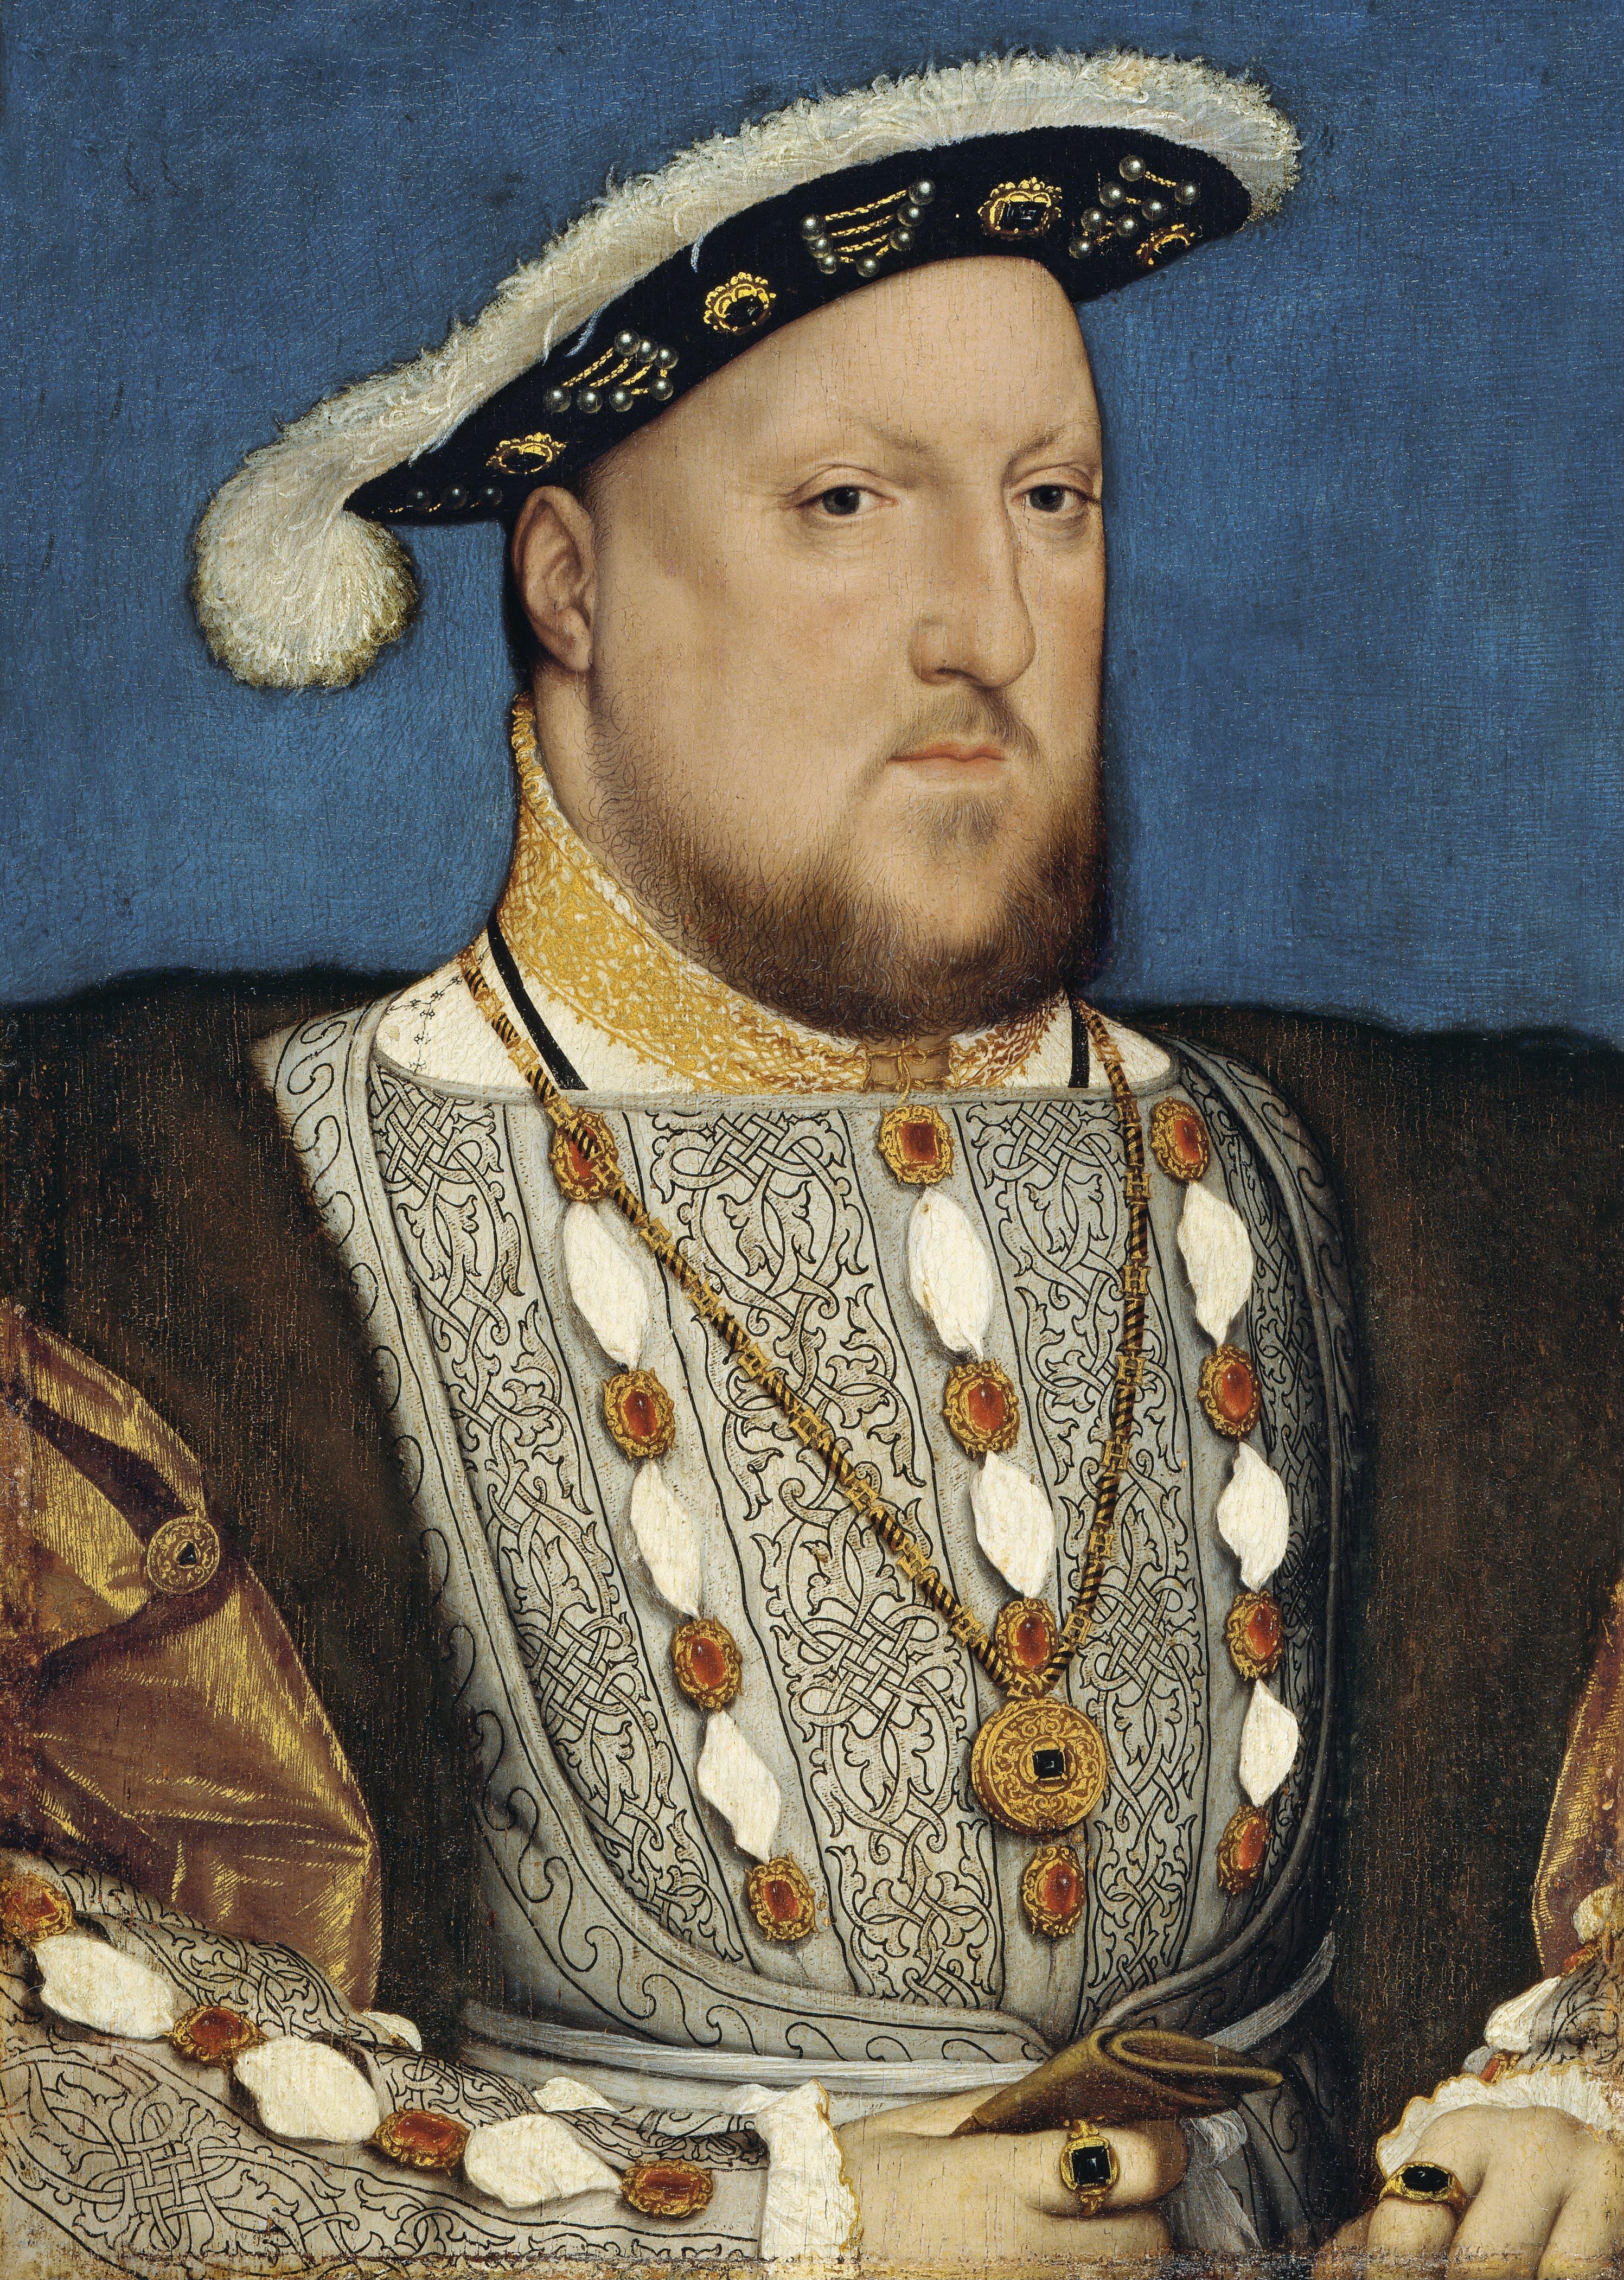 Henry fitzroy son of henry viii